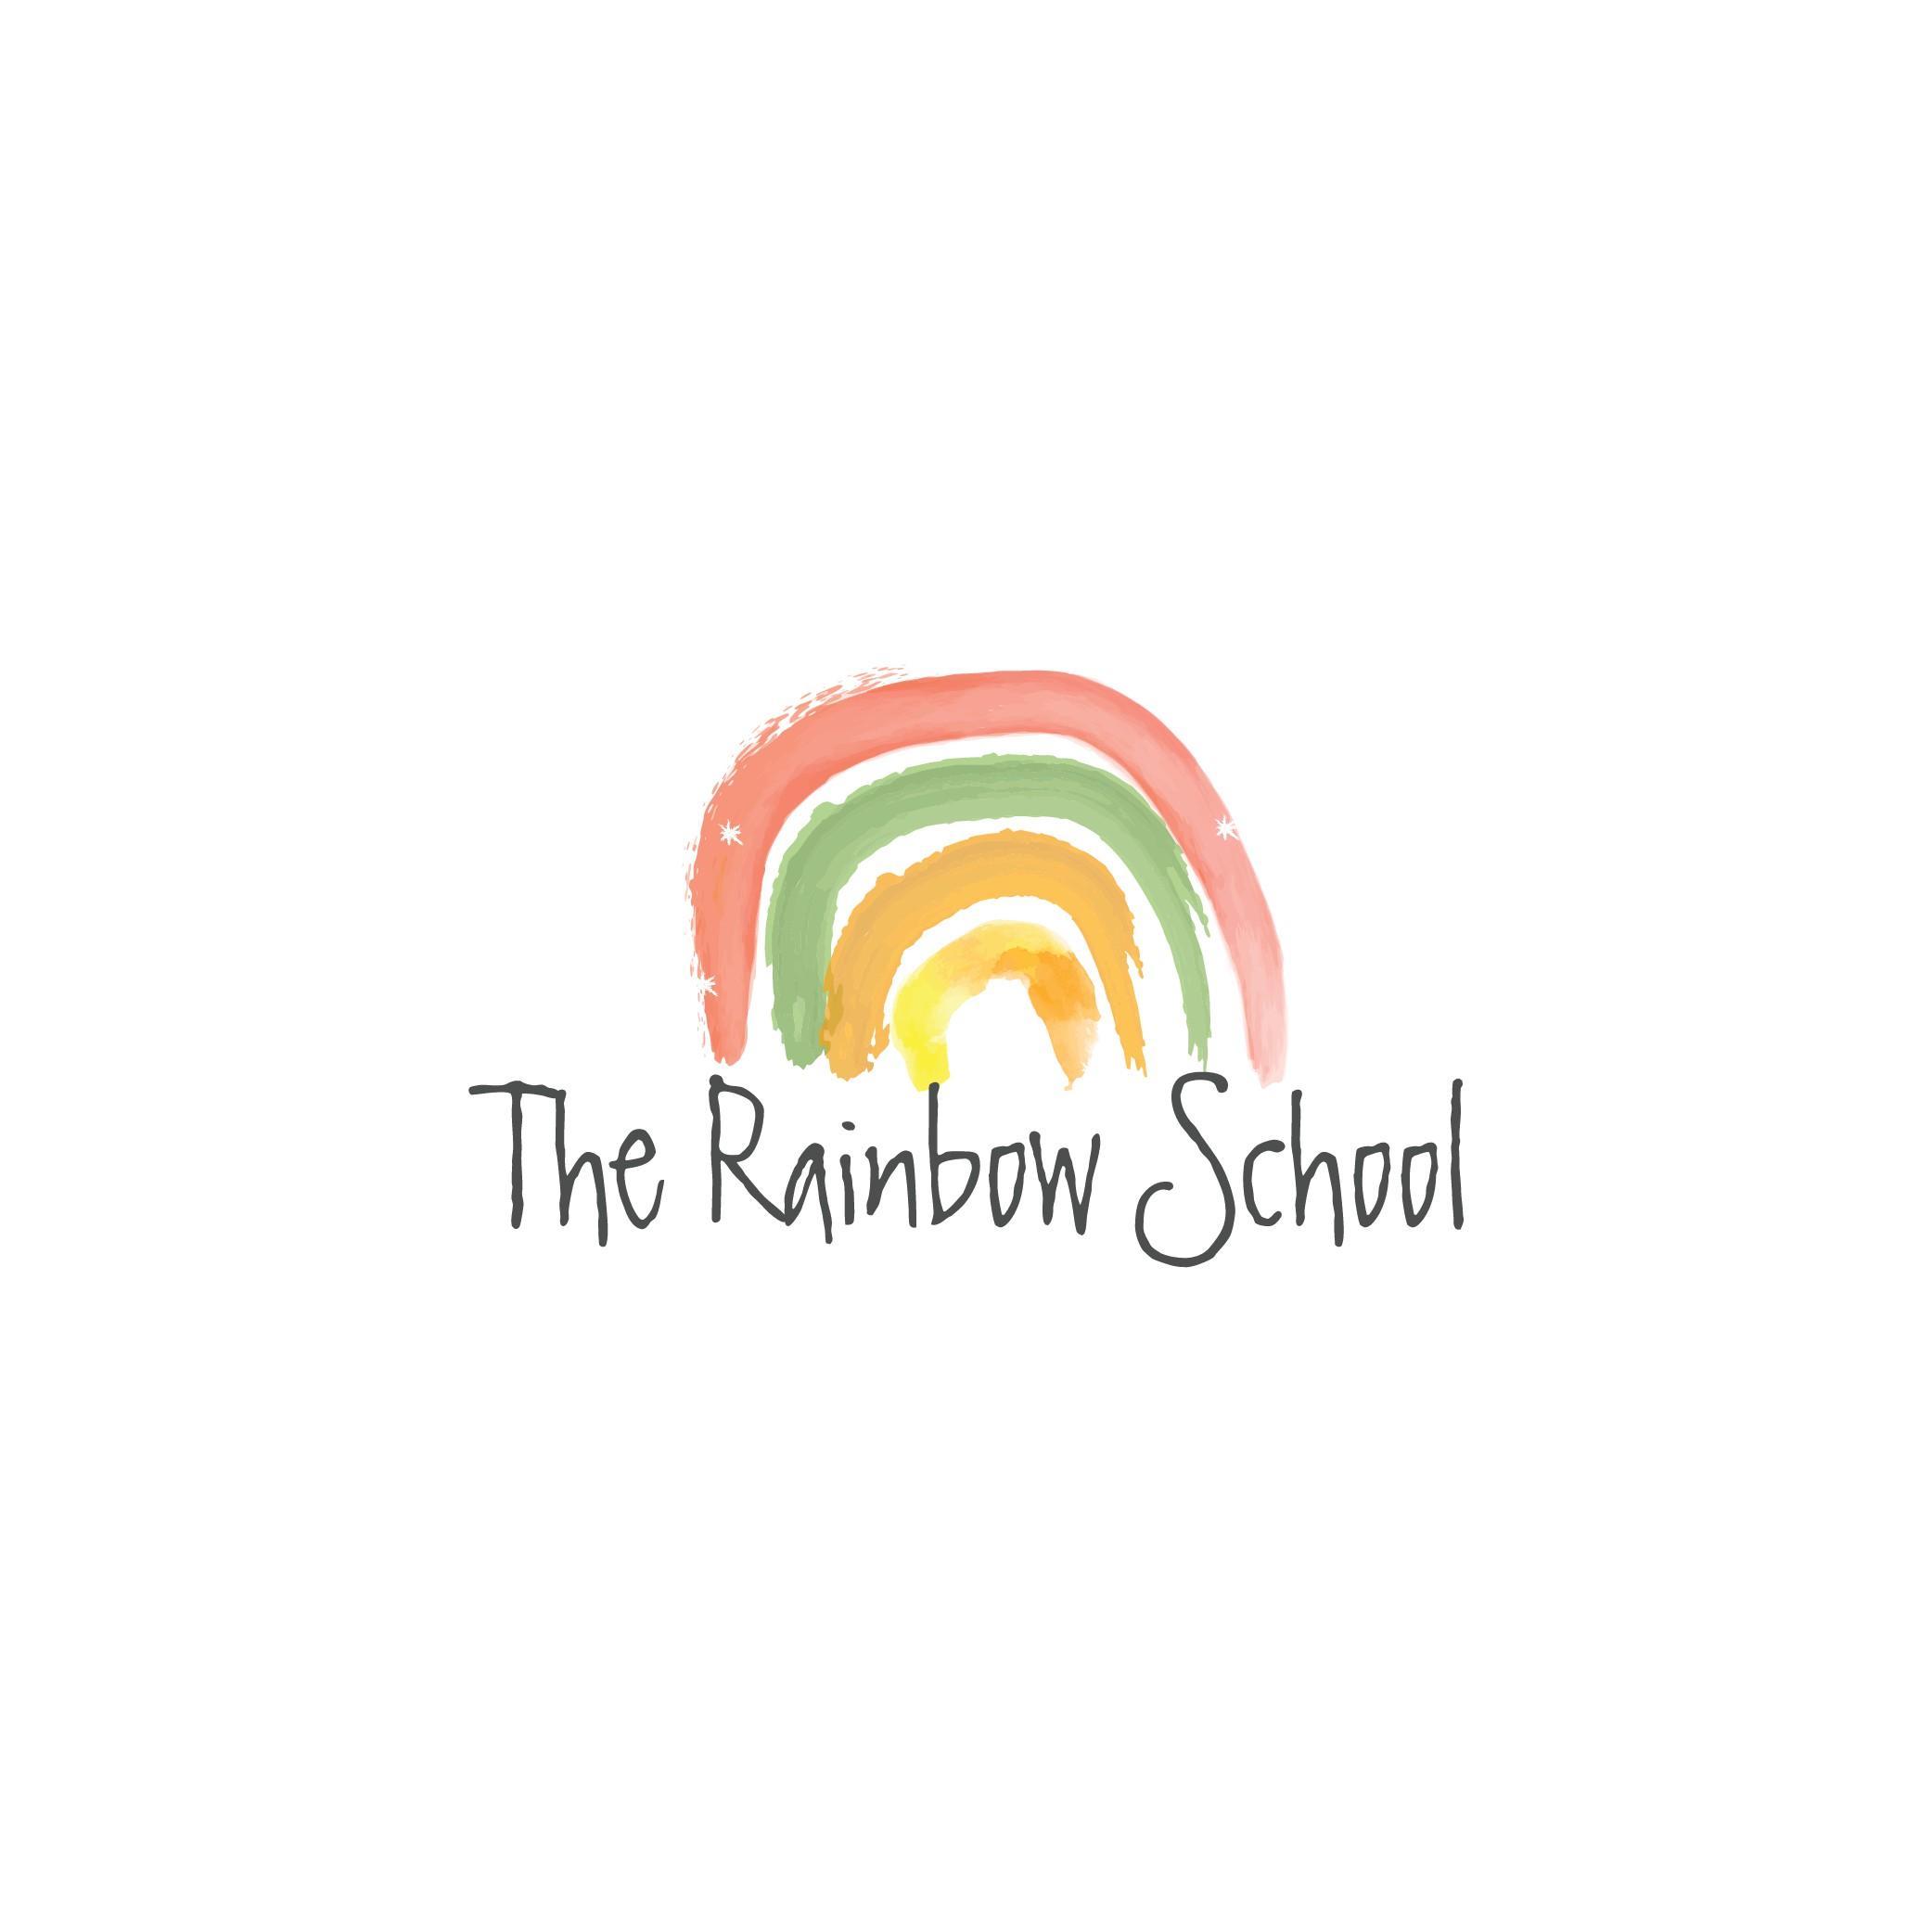 The Rainbow School